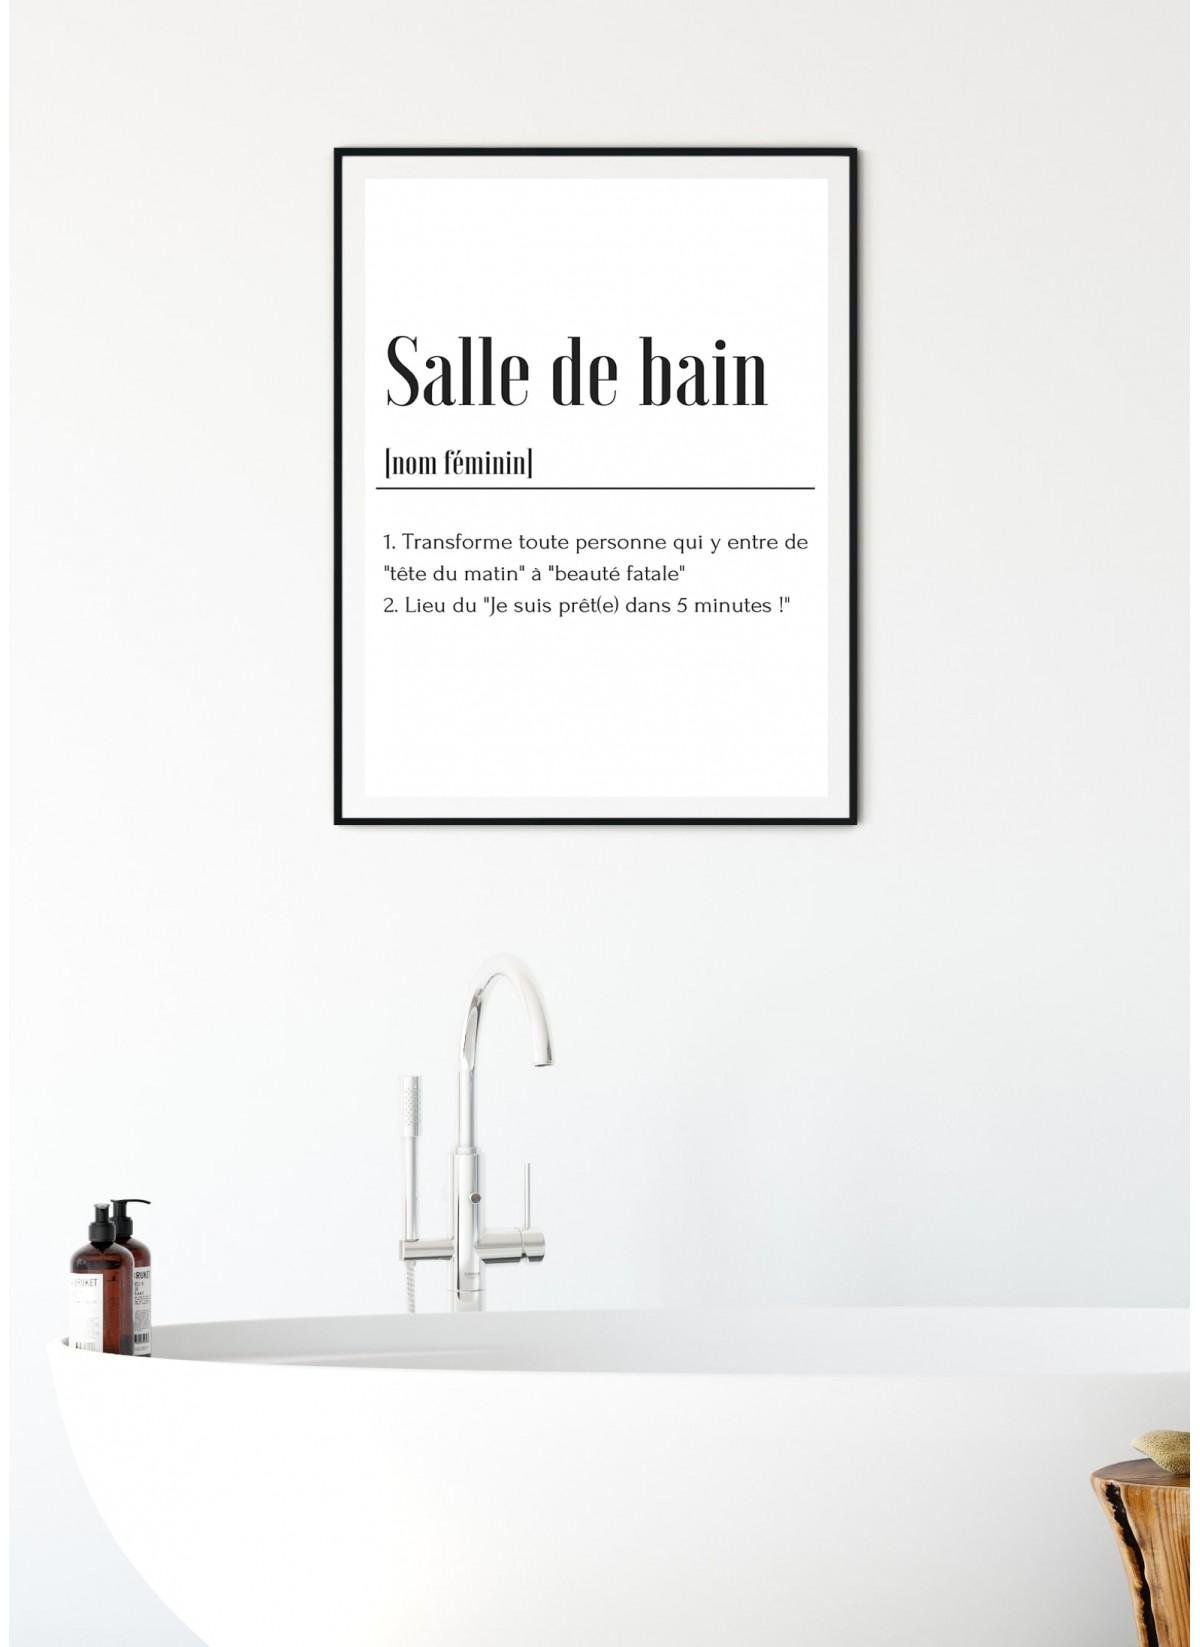 New Une Salle De Bains Meaning